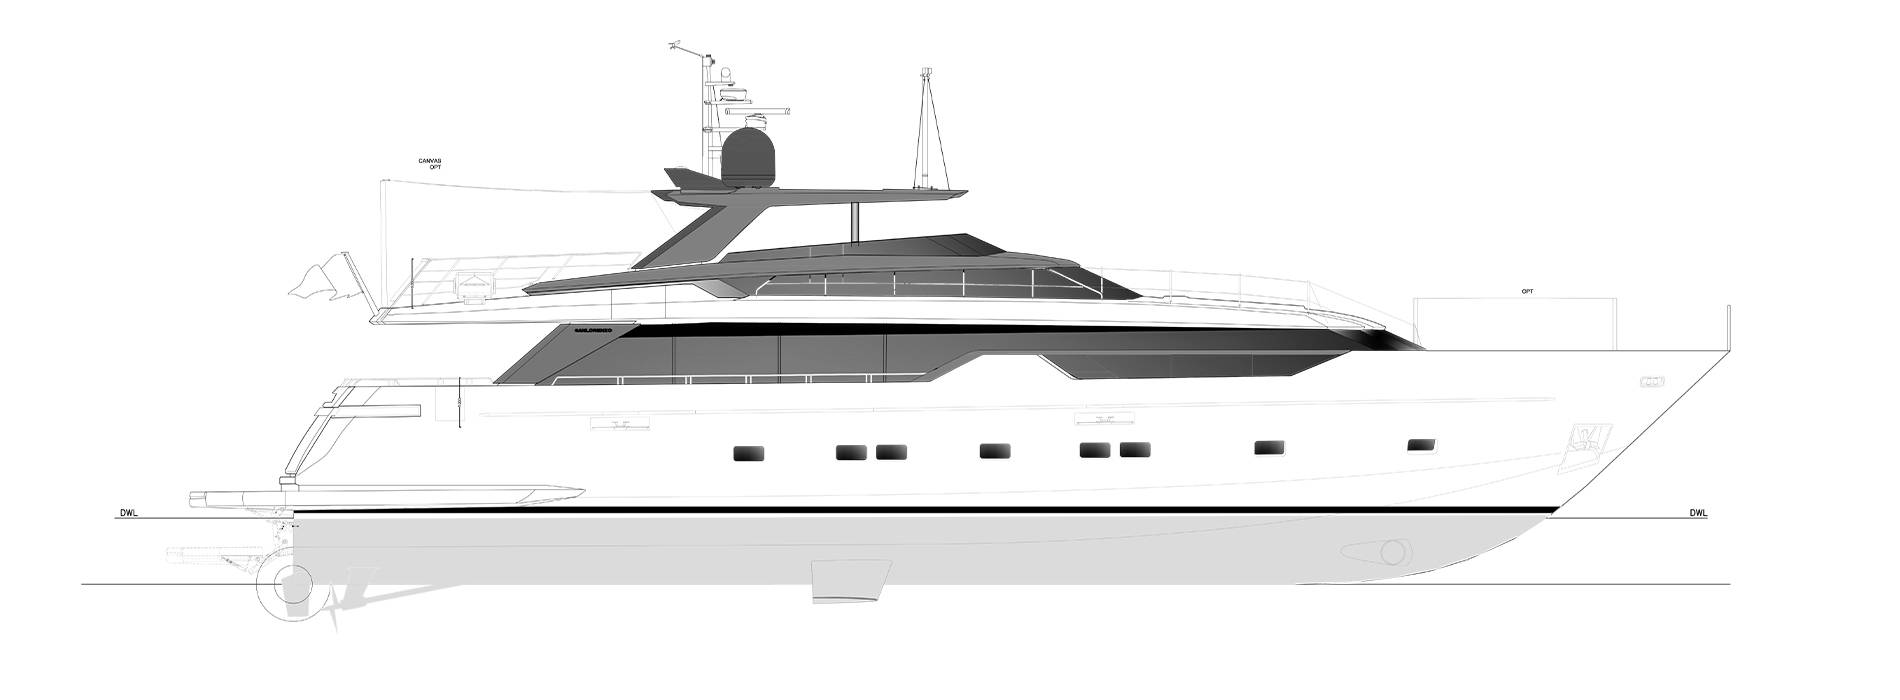 Sanlorenzo Yachts SL102A-746 Profilo